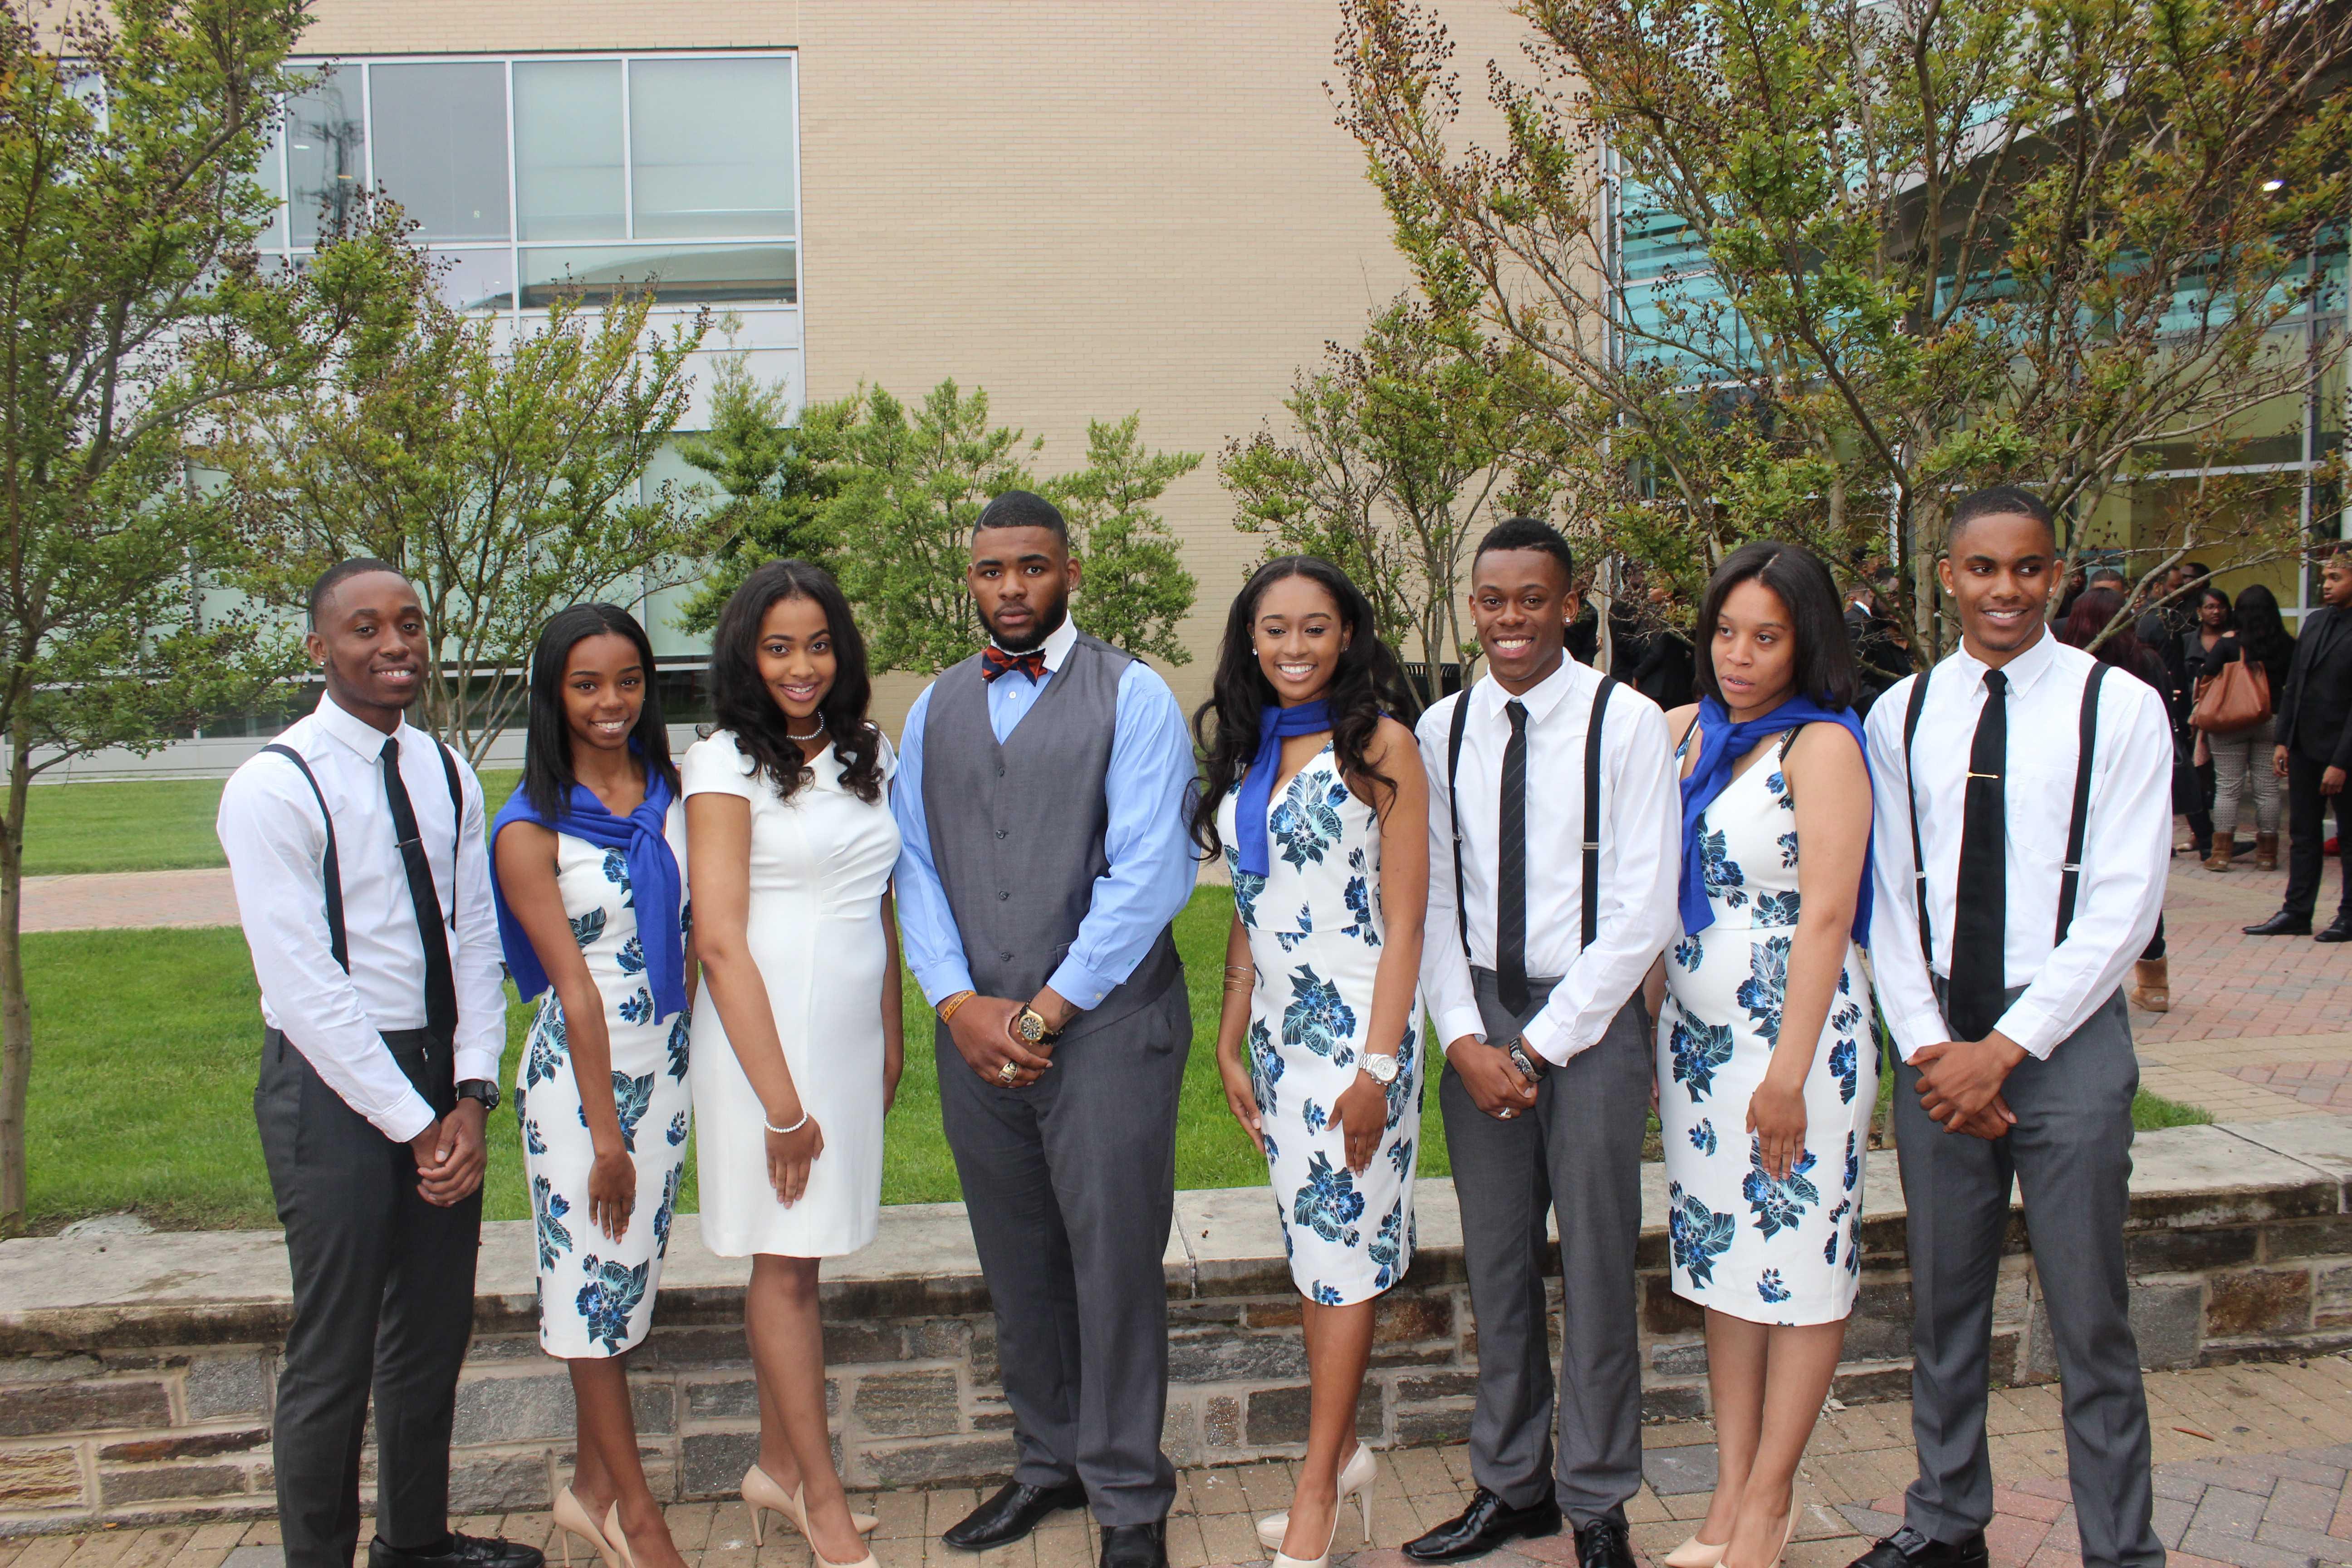 Morgan State University Royal Court 2016-2017.